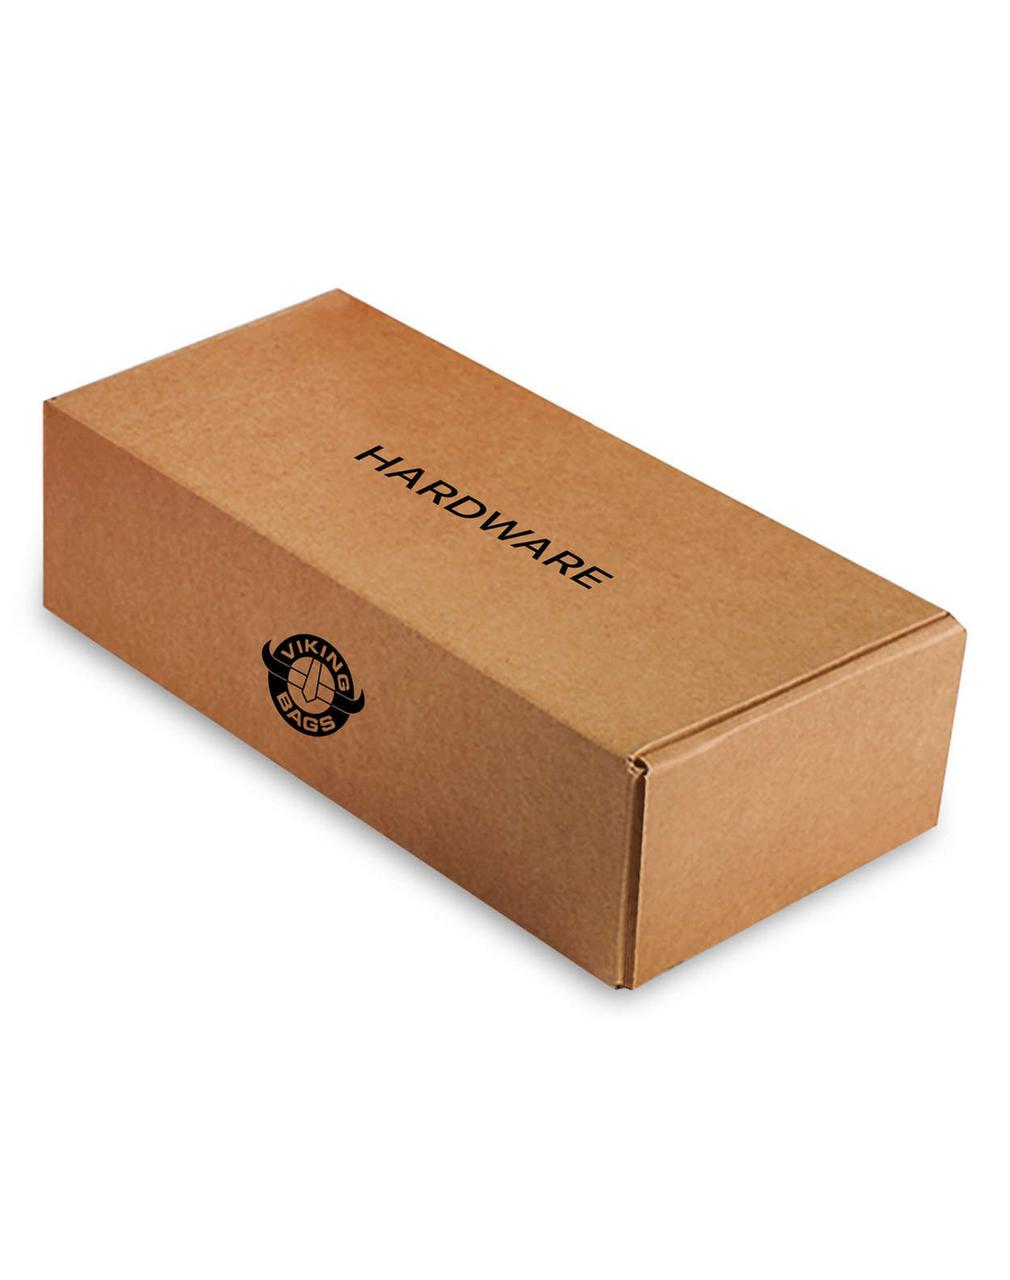 Honda CMX 250C Rebel 250 Charger Single Strap Medium Motorcycle Saddlebags Hardware Box